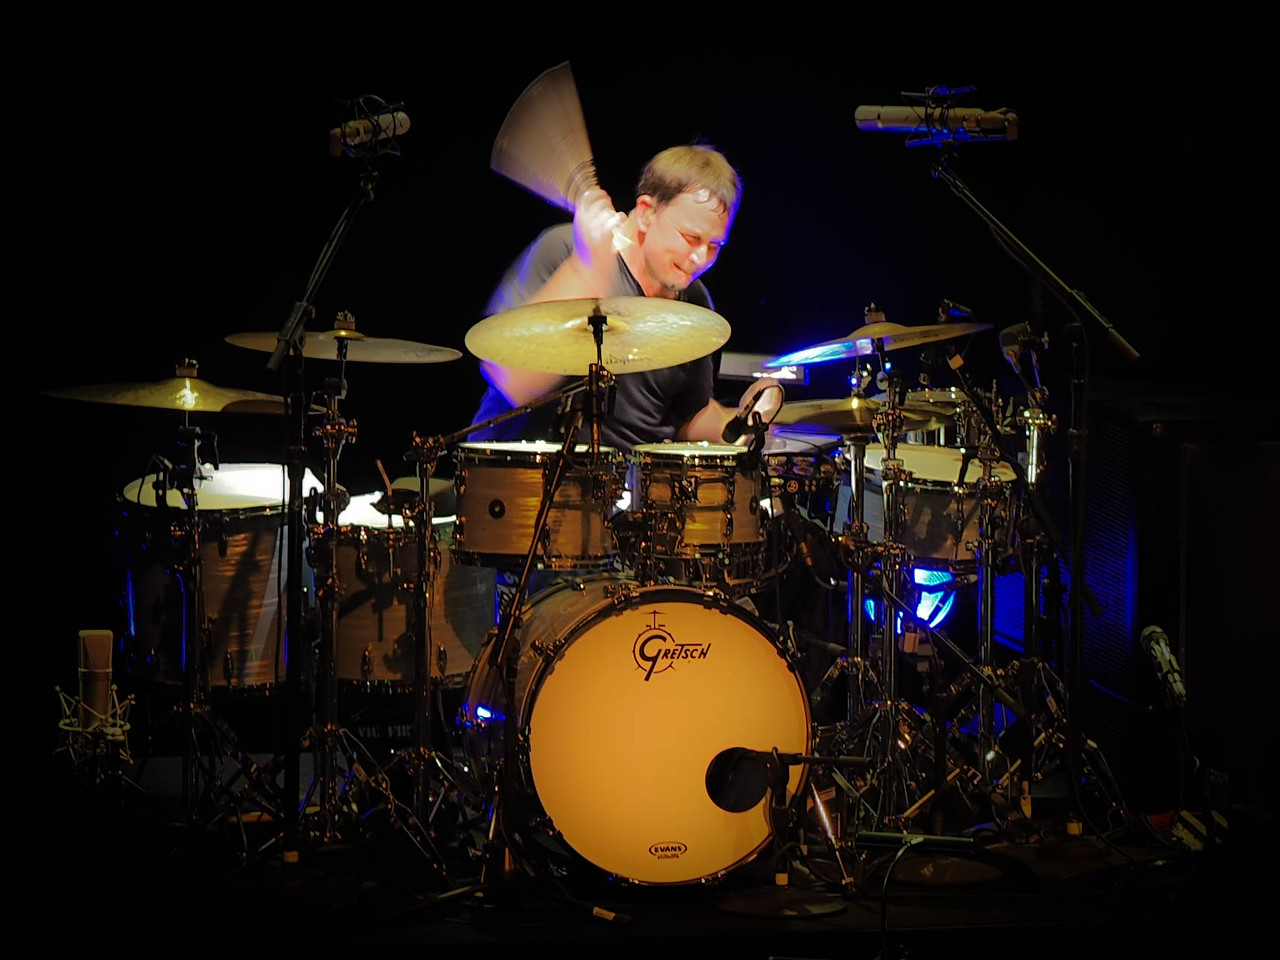 Keith Carlock - Steely Dan @The Beacon Theatre, NYC - Oct 2015